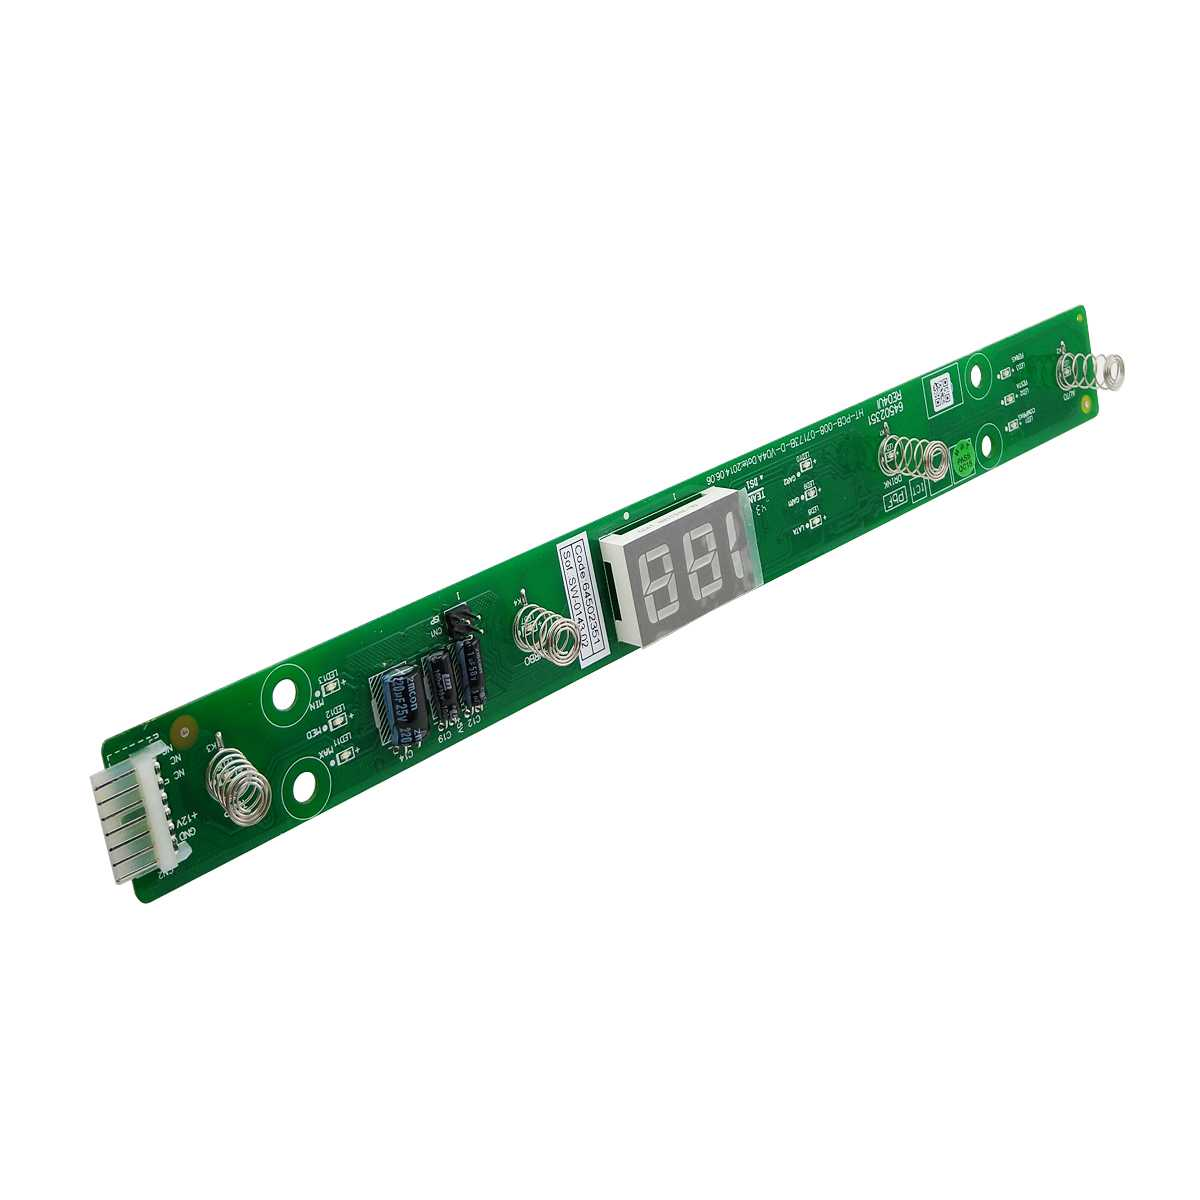 Placa interfac geladeira Electrolux DFN49, DFX49, DFX50, DW50X, DWX50, DF47, DF50, DFW50, DFN50, DF50X, DF49A, DF49X